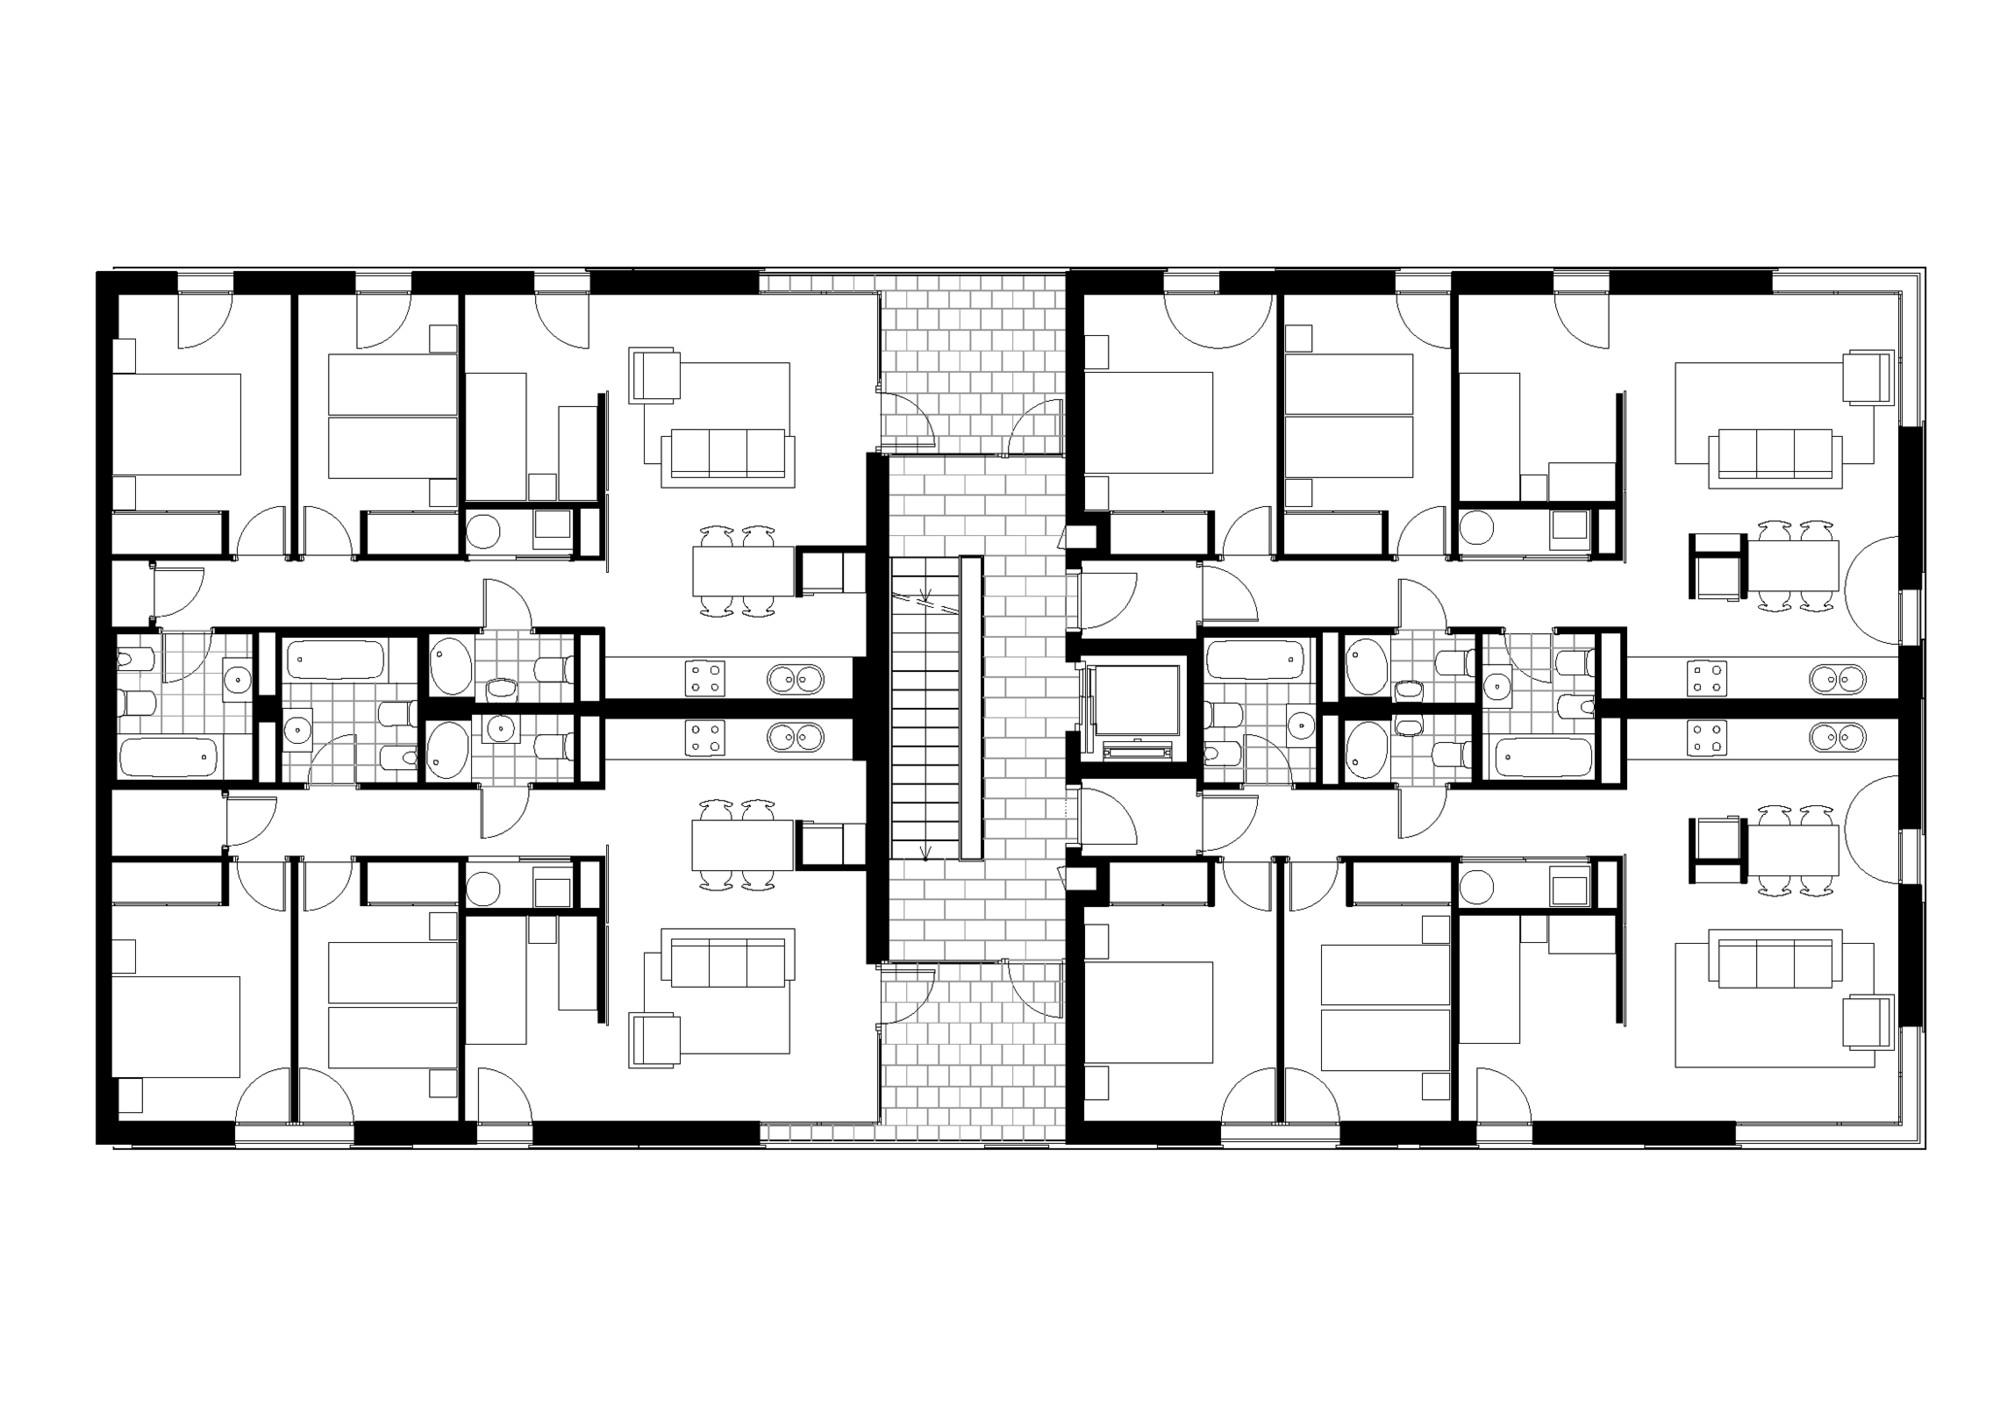 Gallery of 16 social housing for granollers town hall - Fotos de viviendas ...